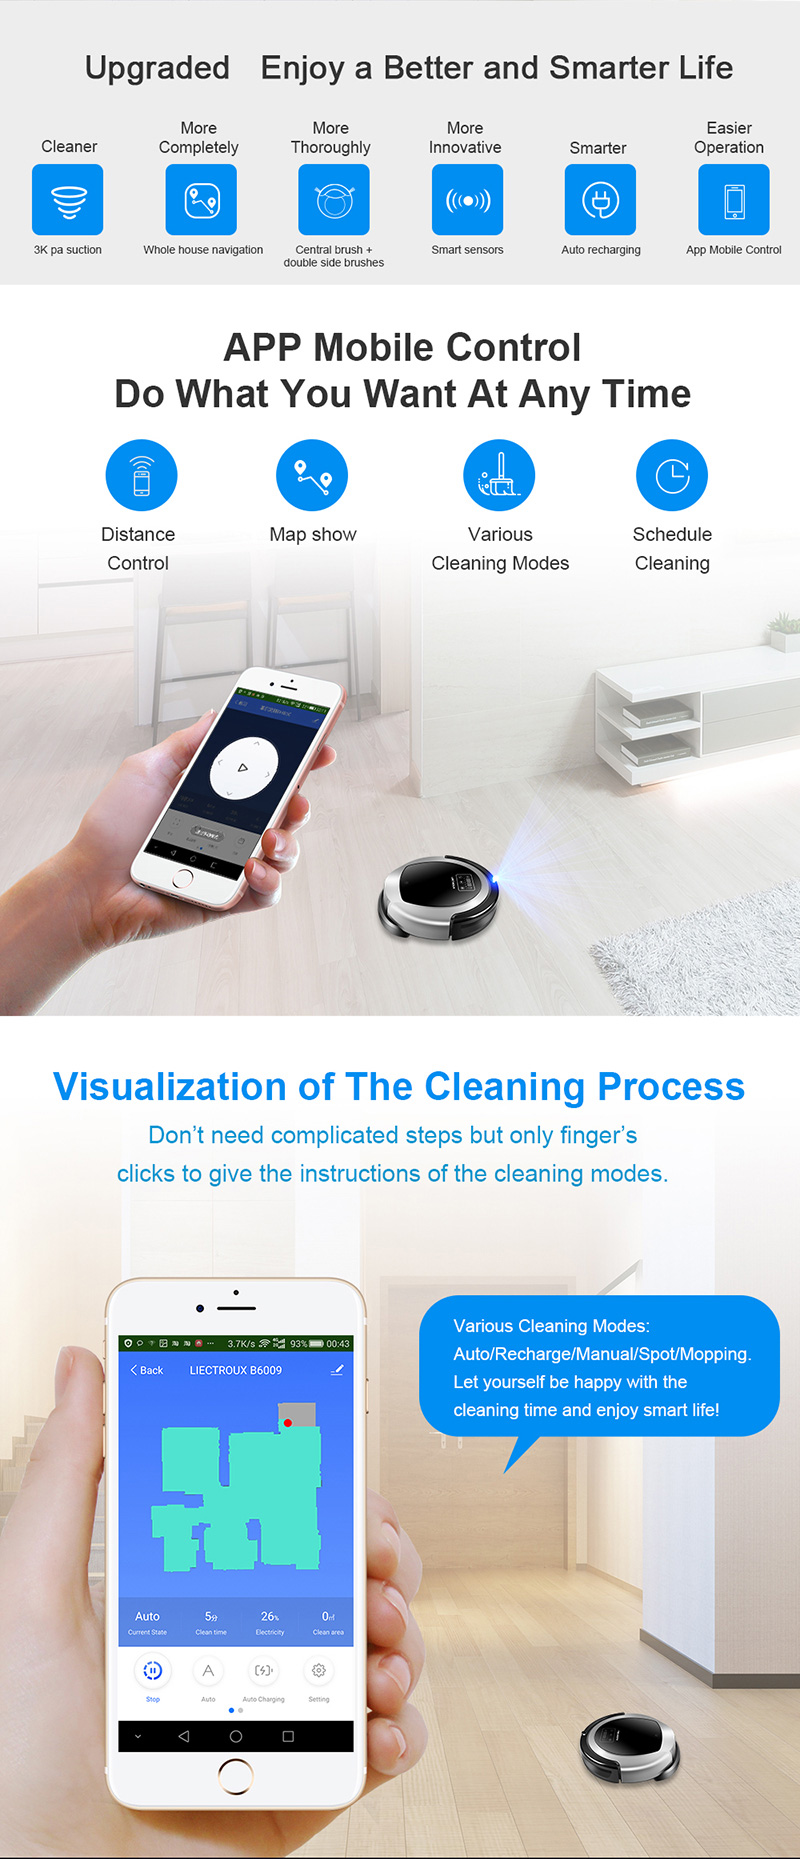 H3b2644cef649475da02afa6236011a6aG (FBA)LIECTROUX Robot Vacuum Cleaner B6009,Map Navigation,Smart Memory,Suction 3000pa,Dual UV Lamp,Wet Dry Mop,Wifi App aspirador